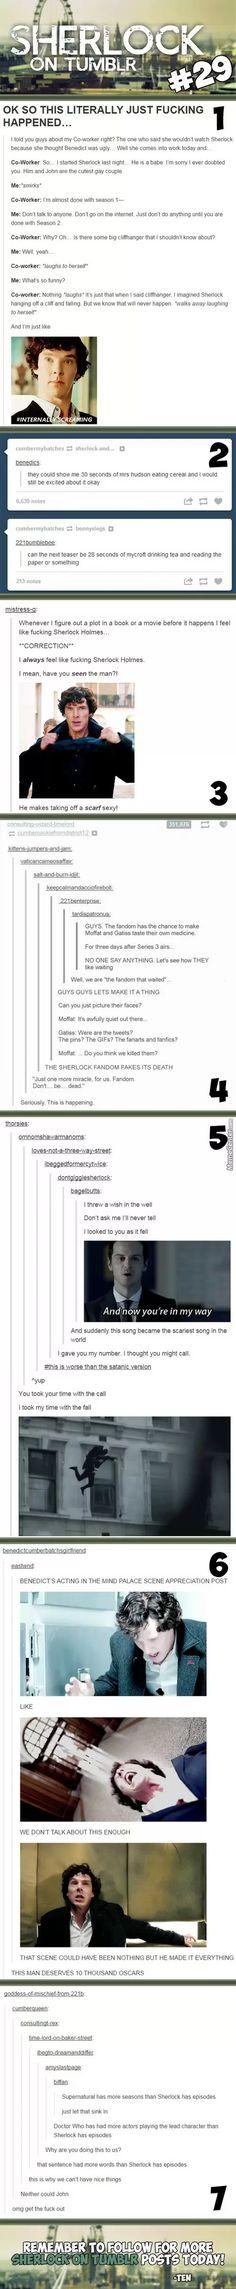 The Sherlock fandom fakes its death xD